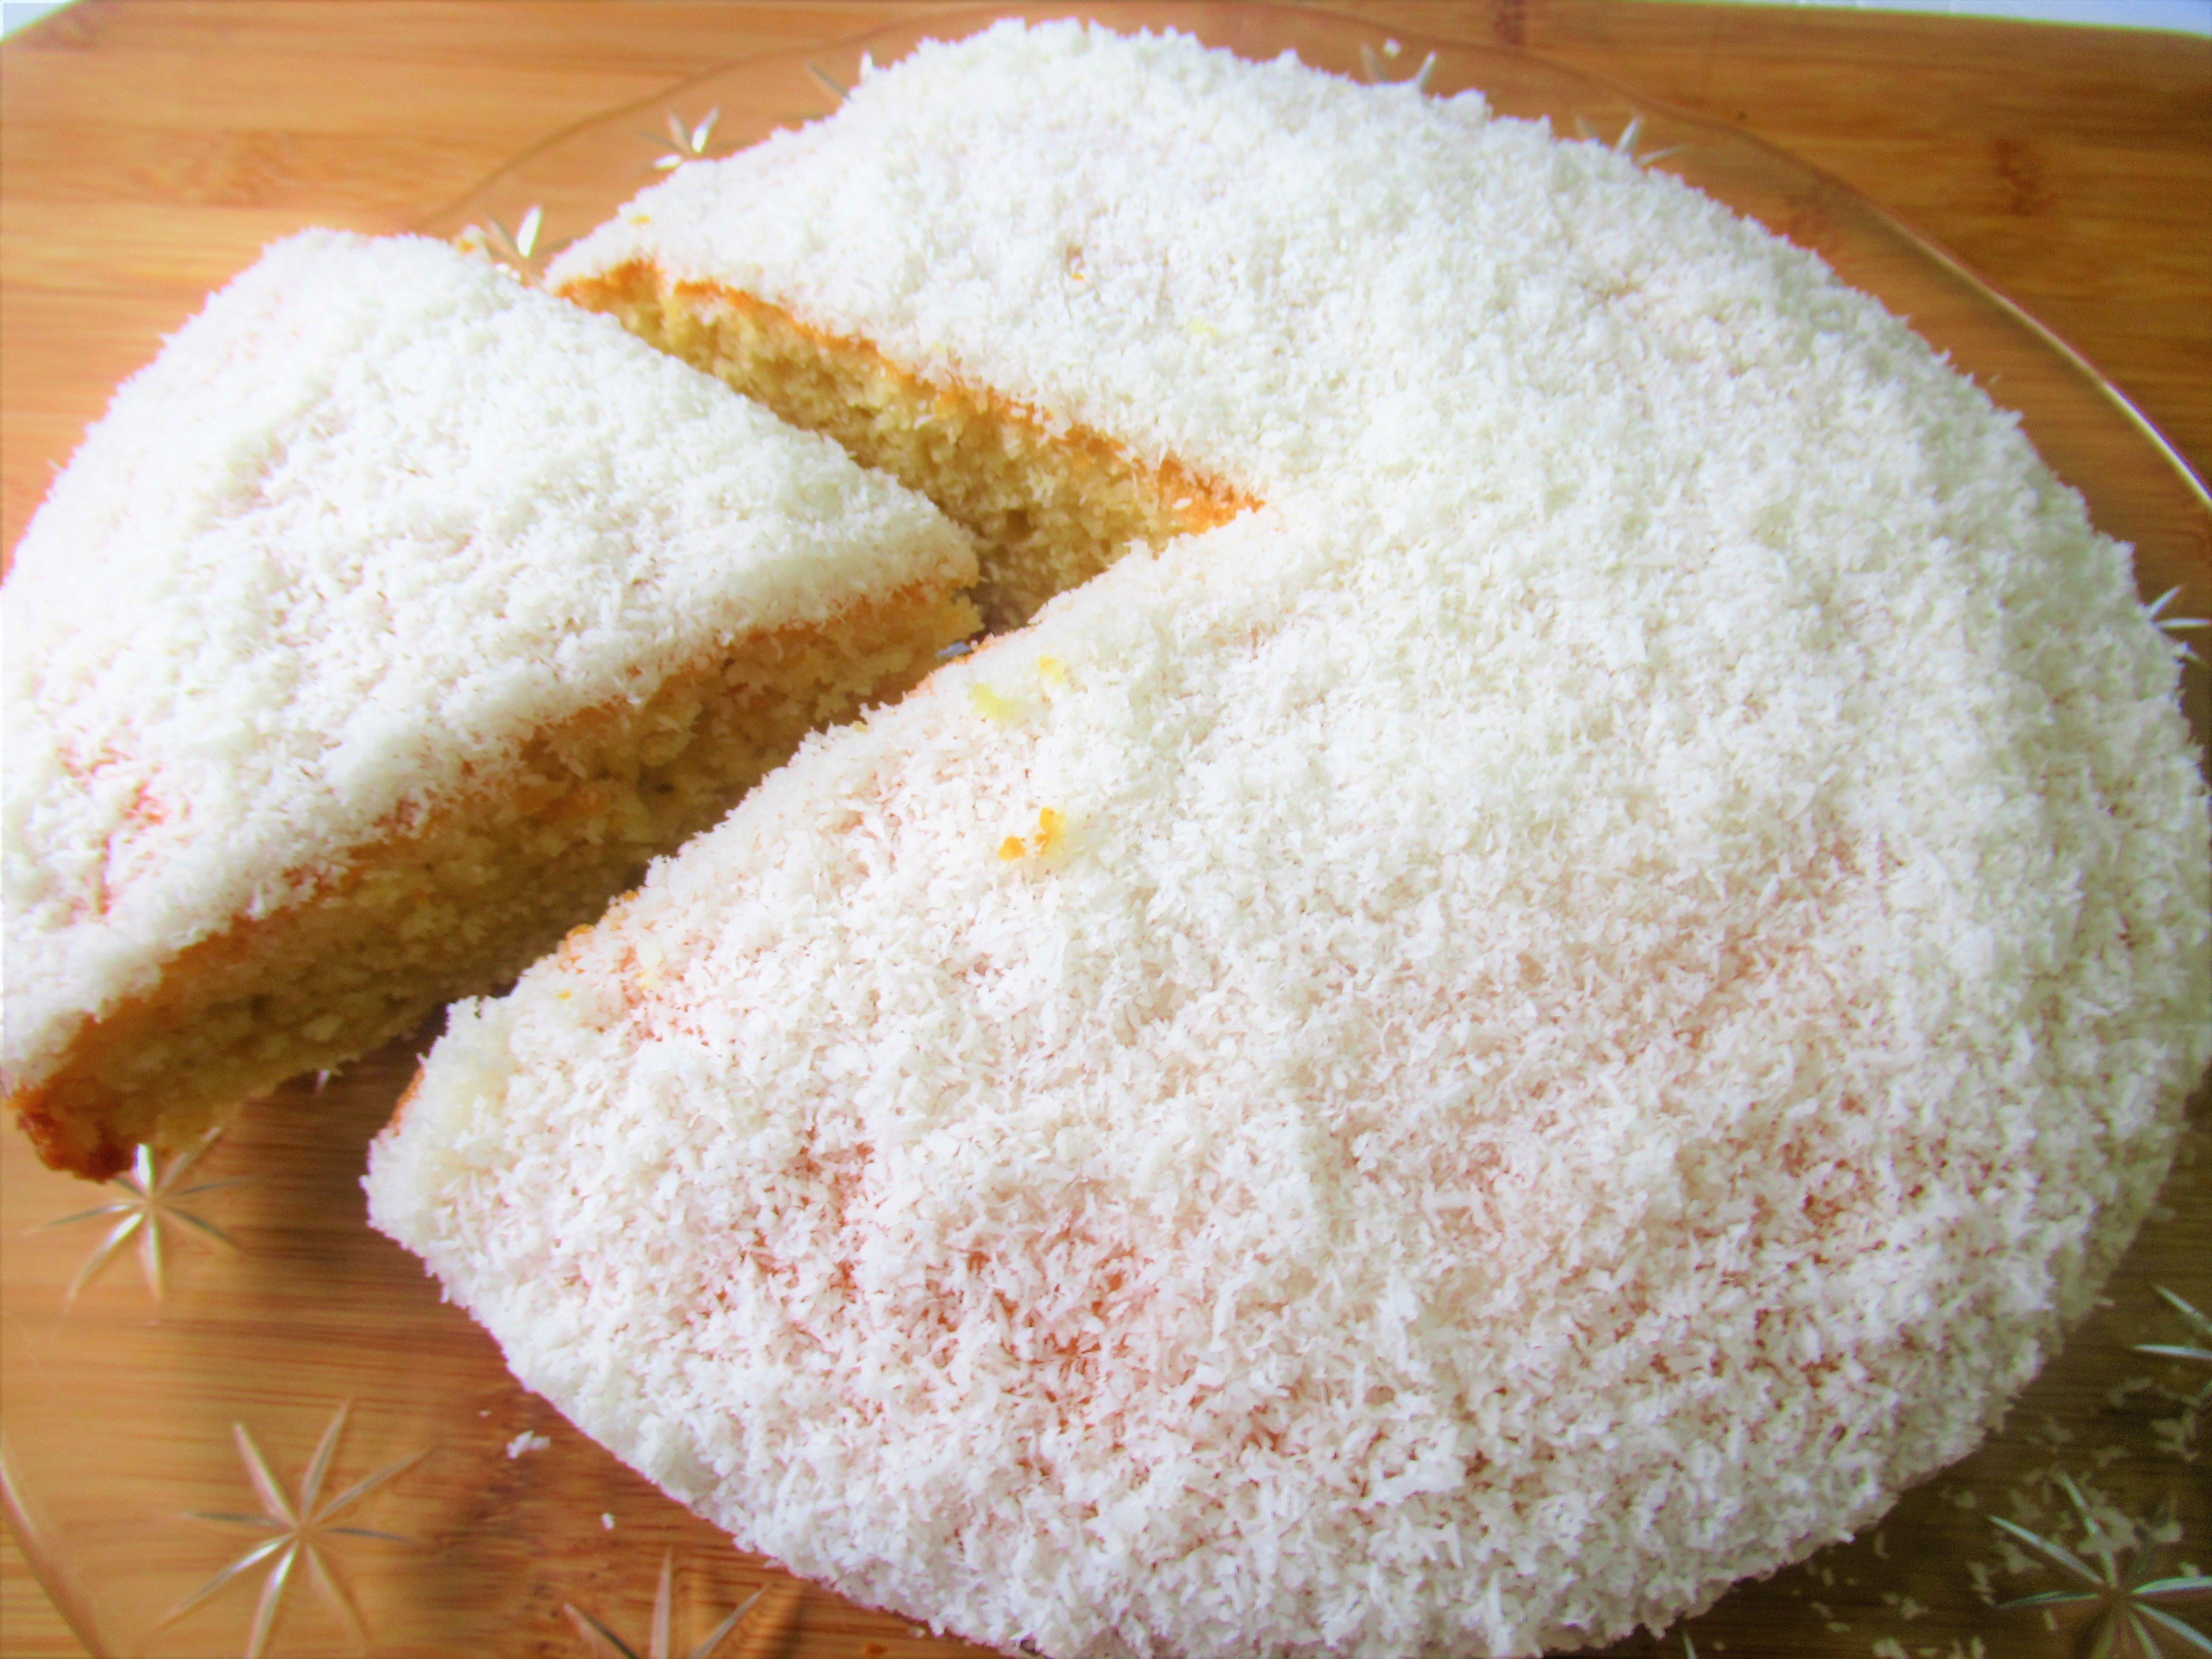 Coconut cake recipe easy dessert httpsyoutubechannel meals forumfinder Choice Image